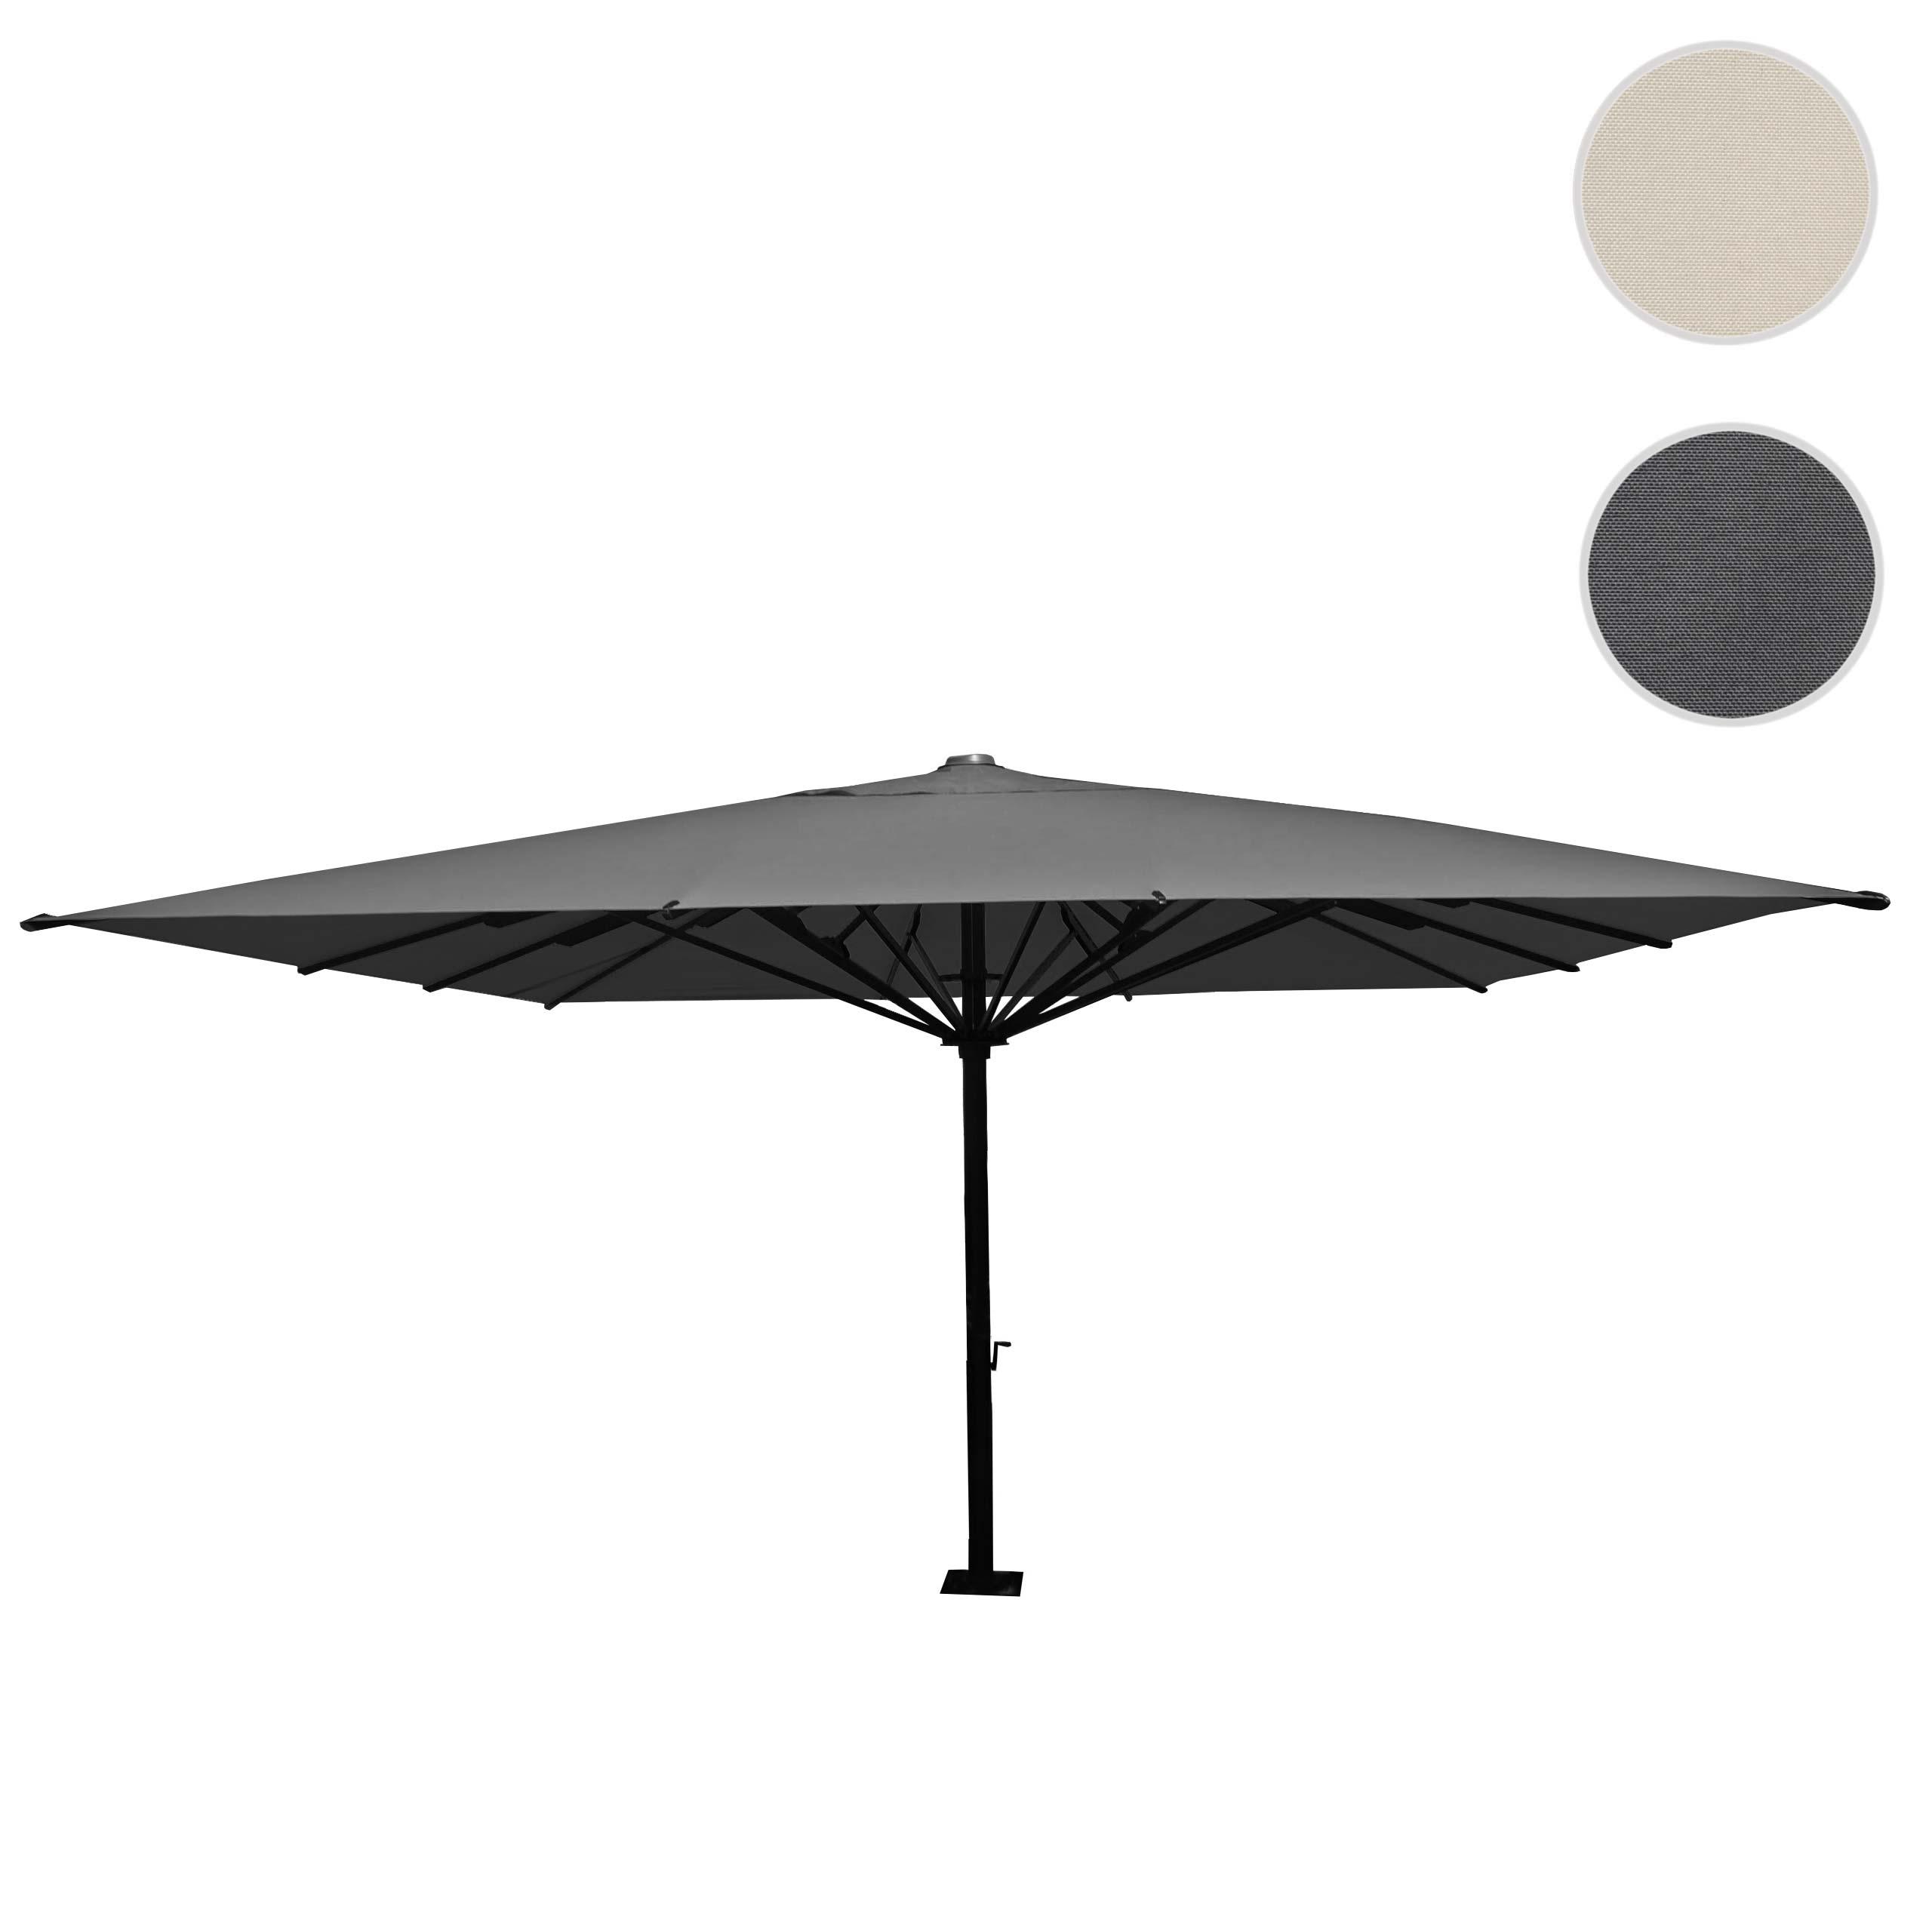 Mendler Gastronomie-Luxus-Sonnenschirm HWC-D20, XXL-Schirm Marktschirm, 5x5m (Ř7,2m) Polyester/Alu 75kg ~ Va 58554